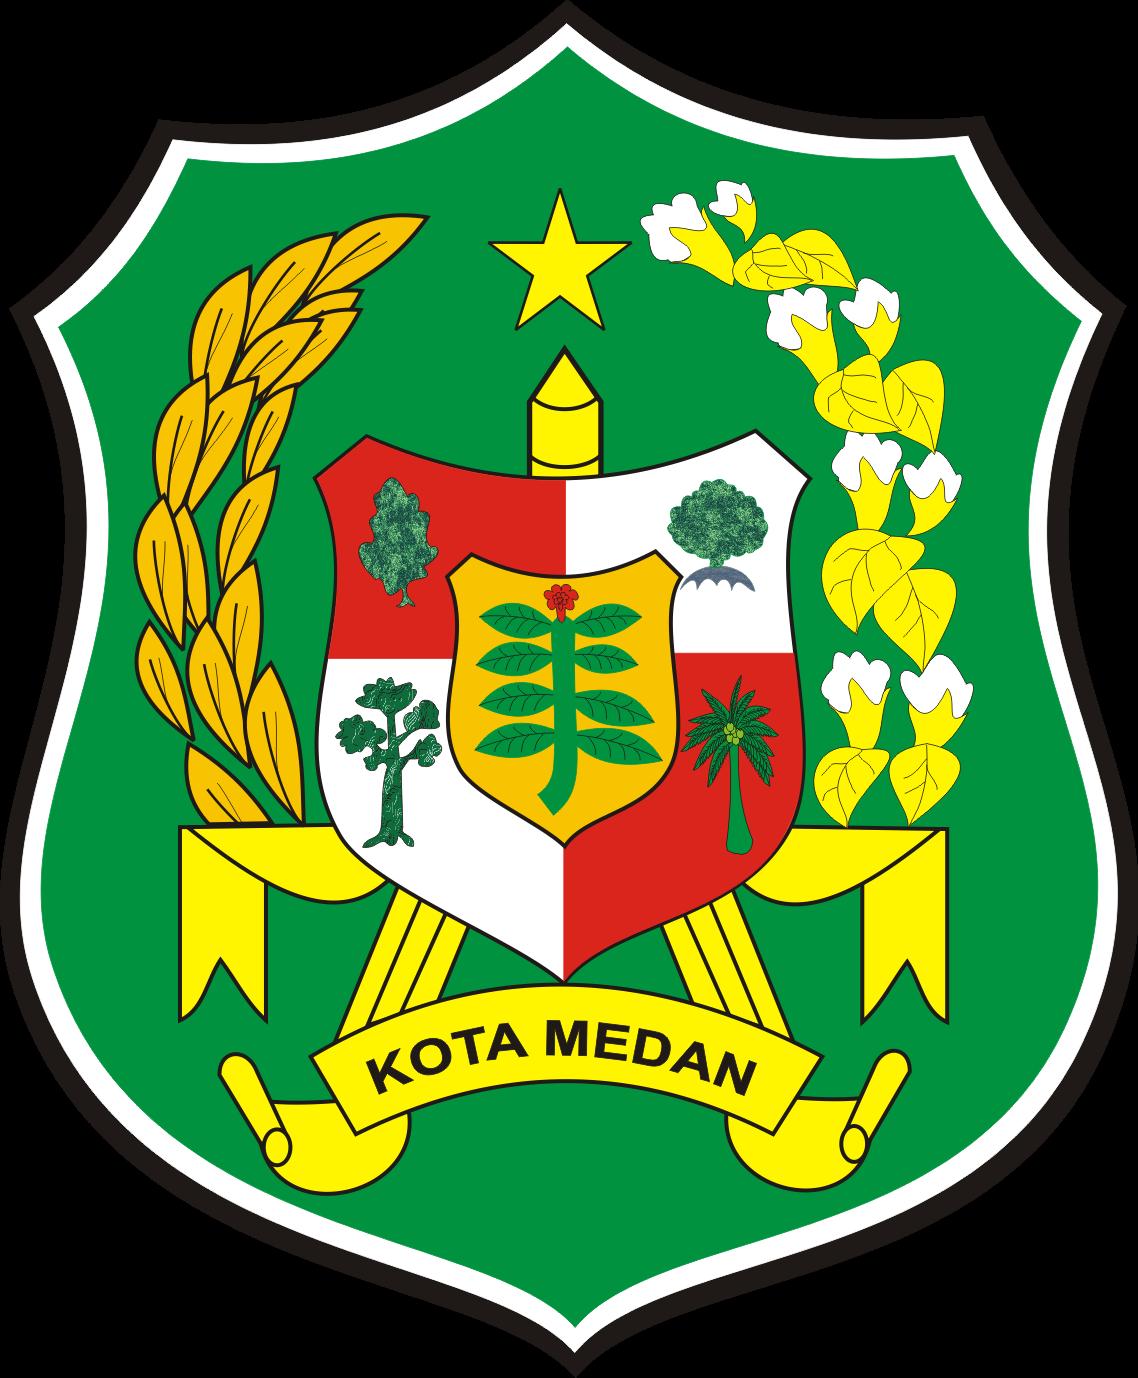 Membongkar Arti Logo Kota Medan Cerita Medan